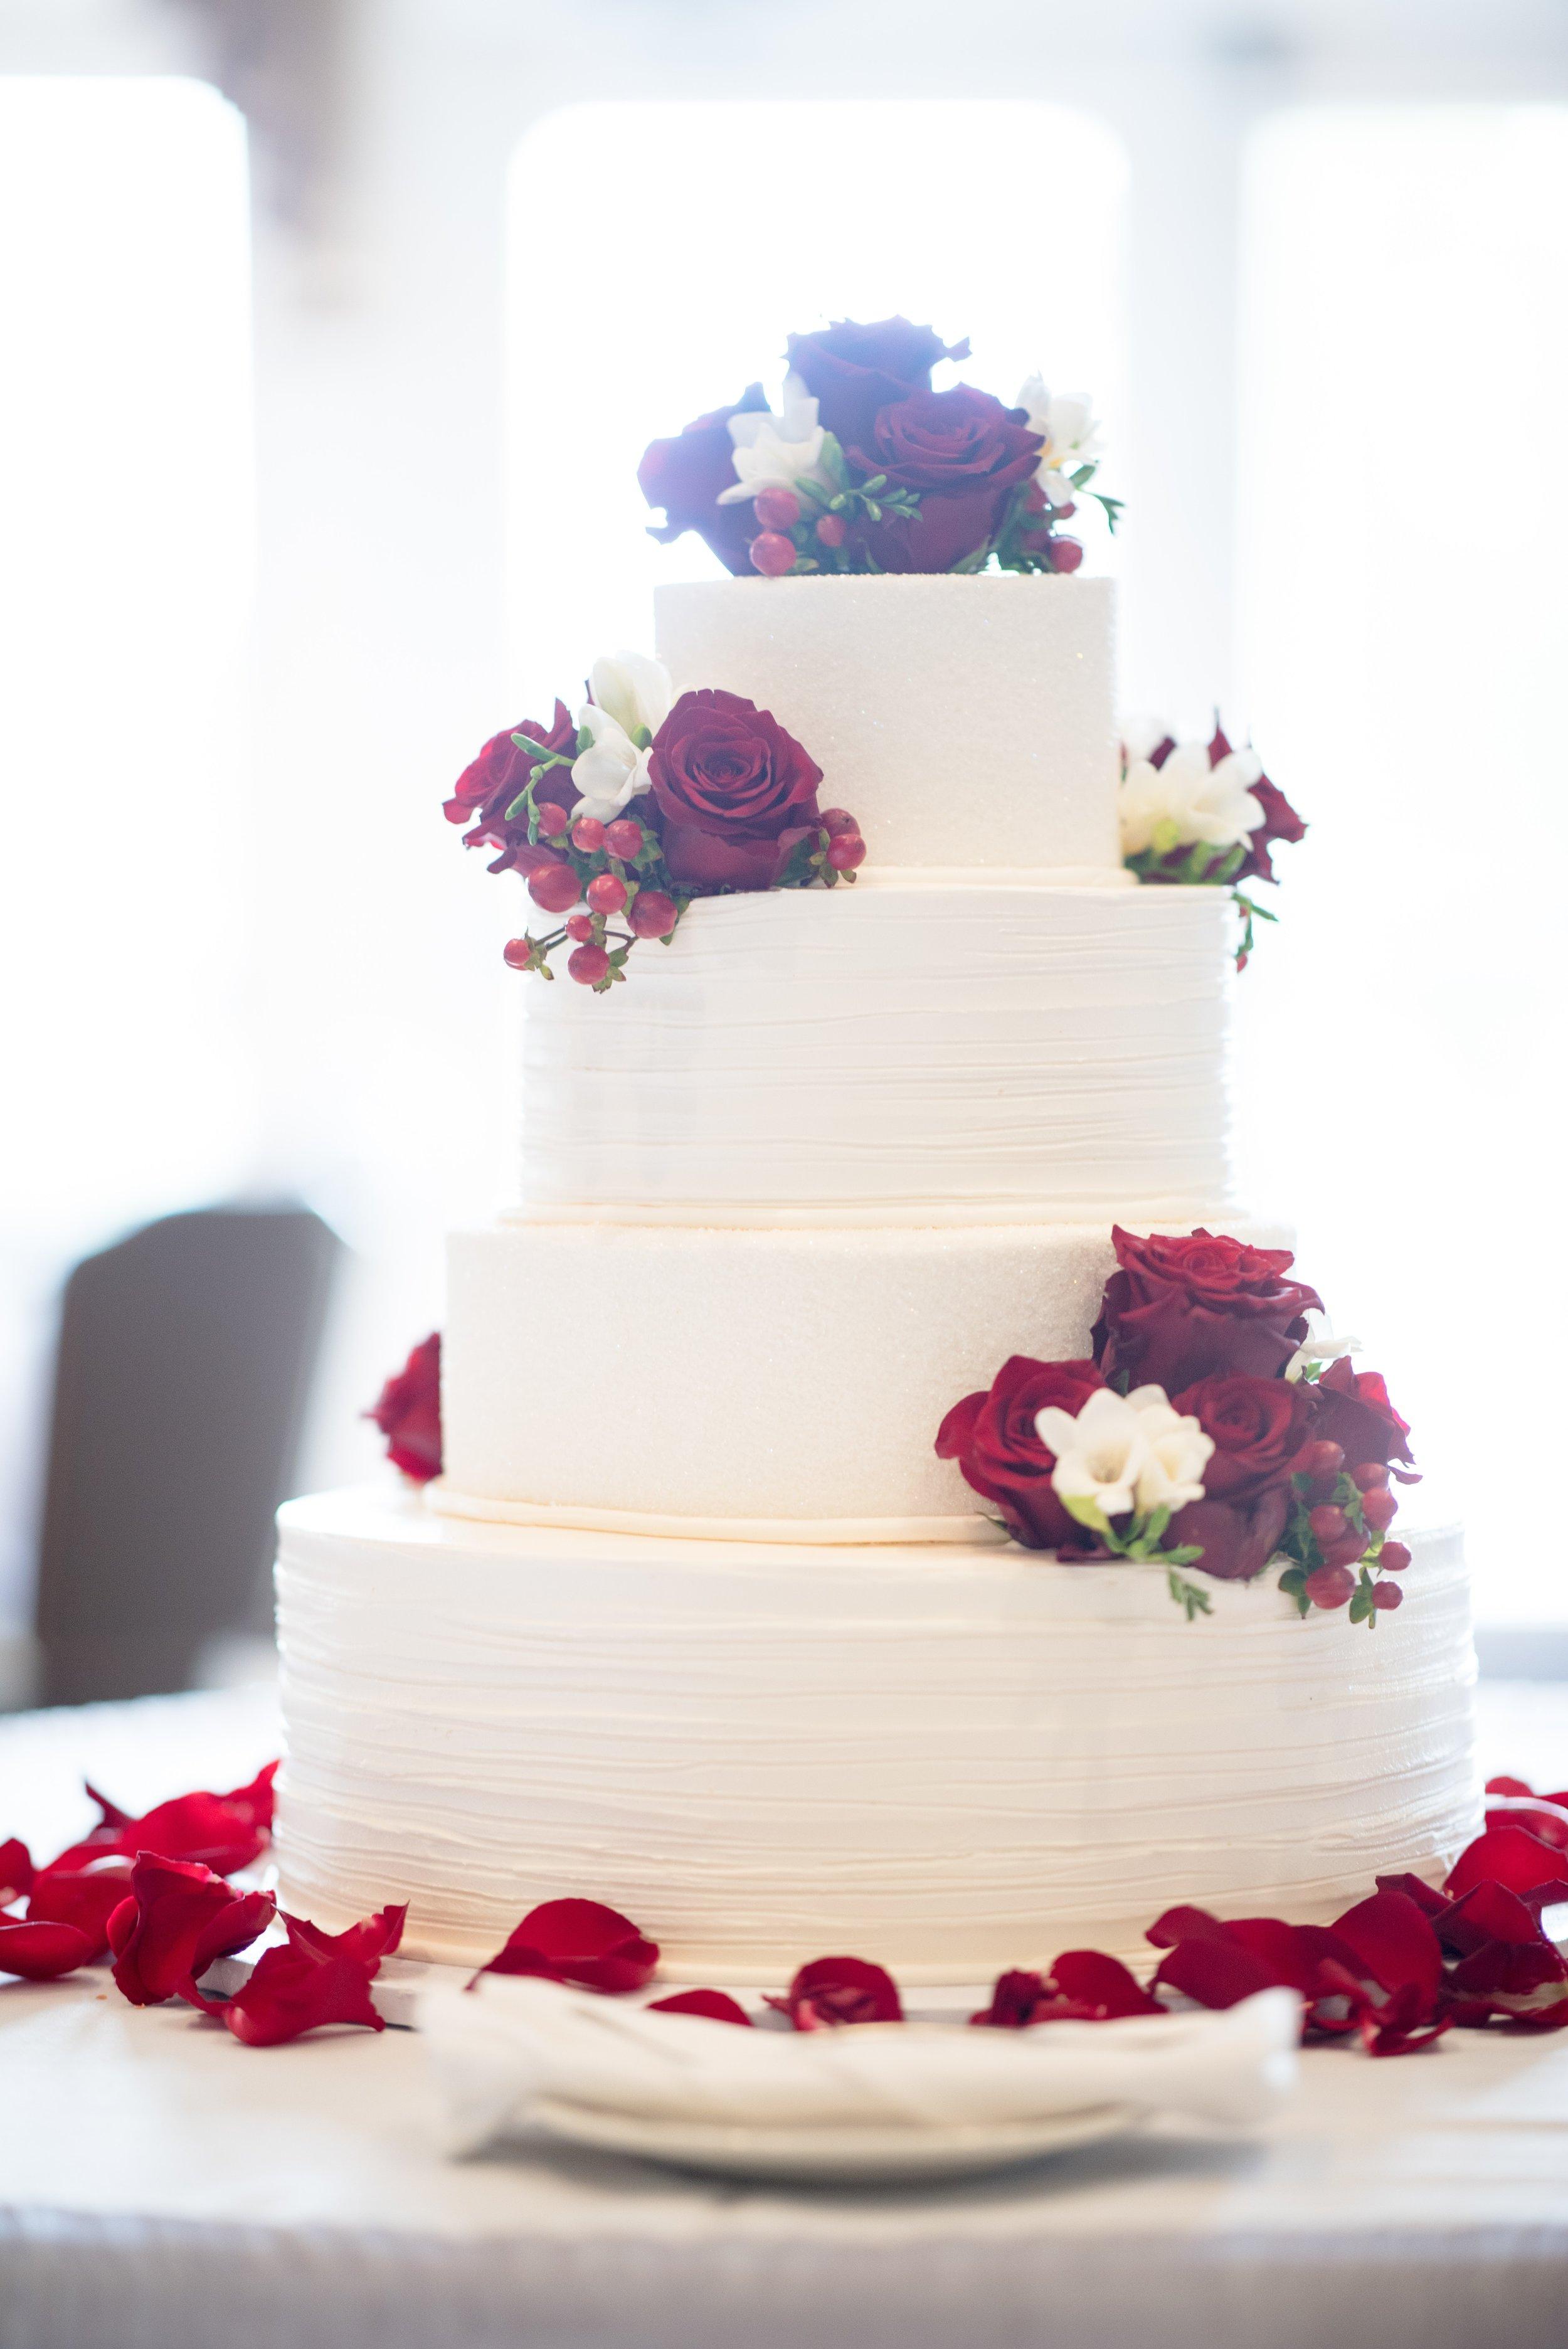 cake-celebration-chocolate-1494109.jpg